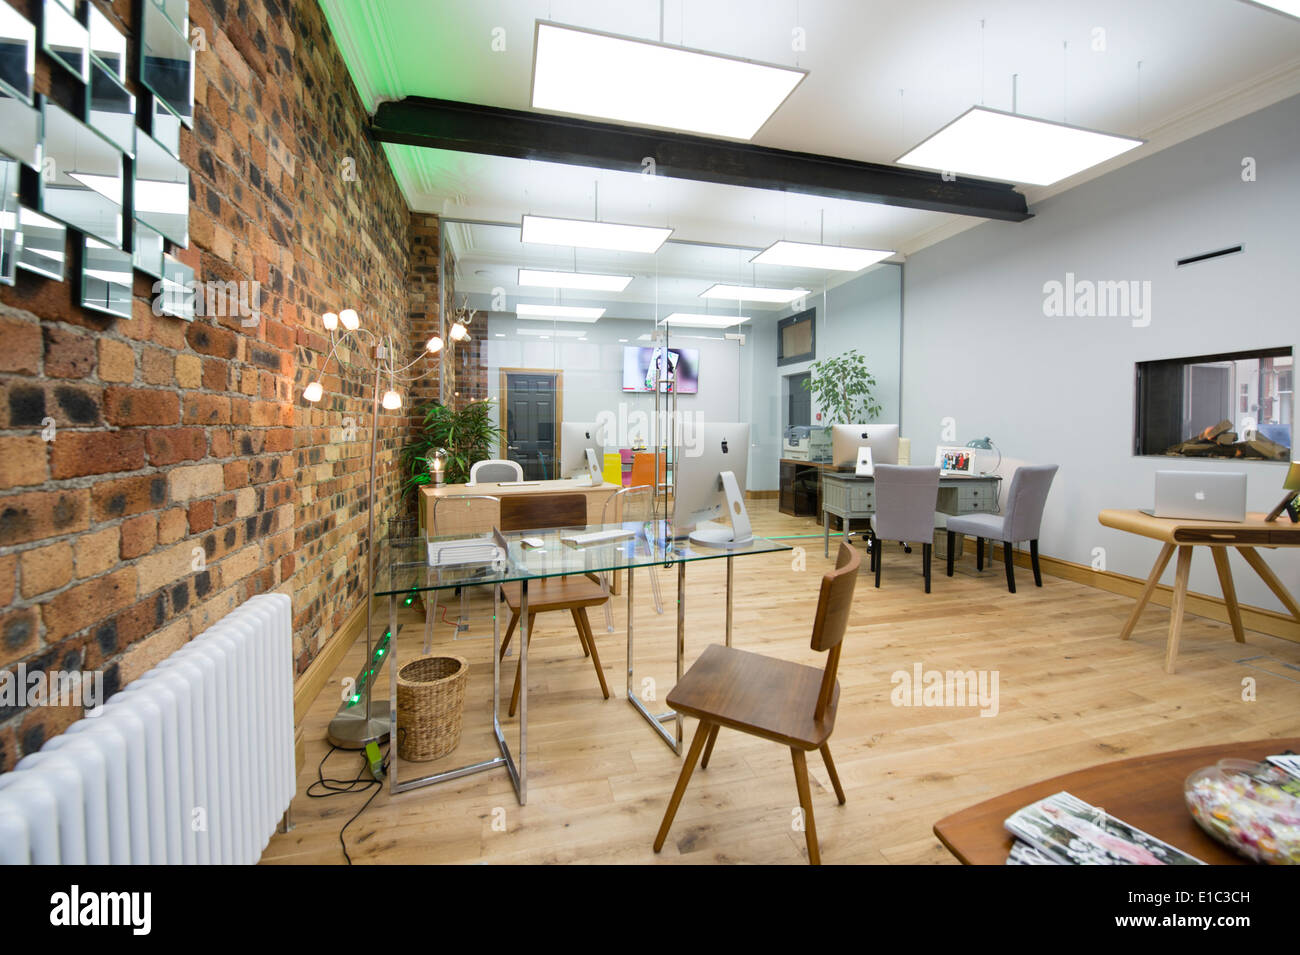 a modern clean light airy open plan estate agent s office interior